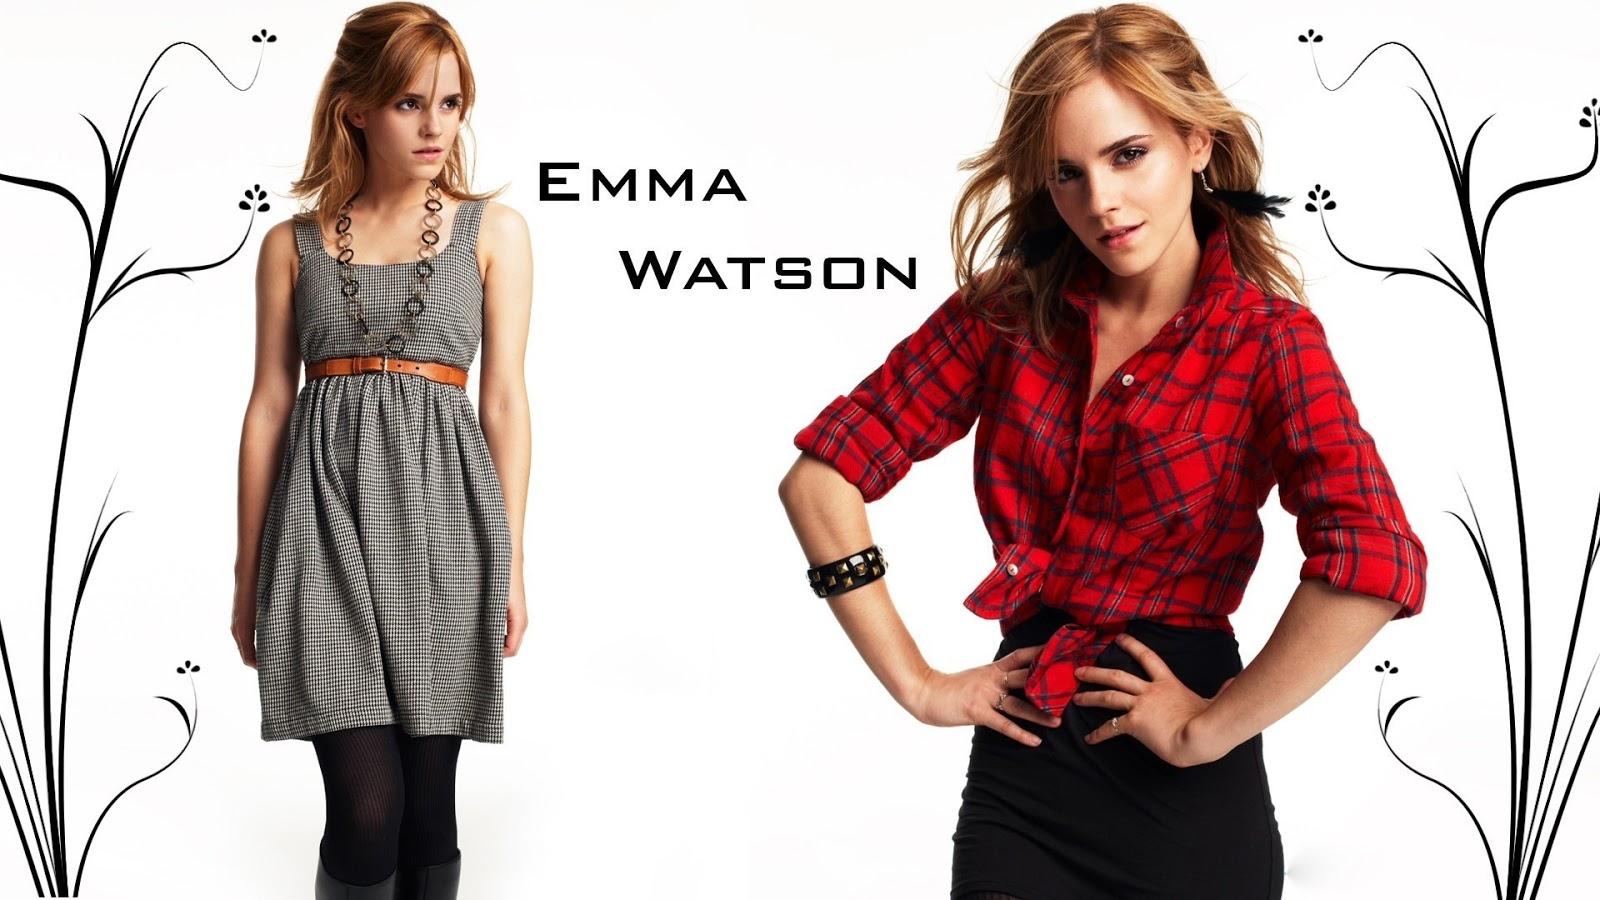 Emma Watson HD Photoshoot Image